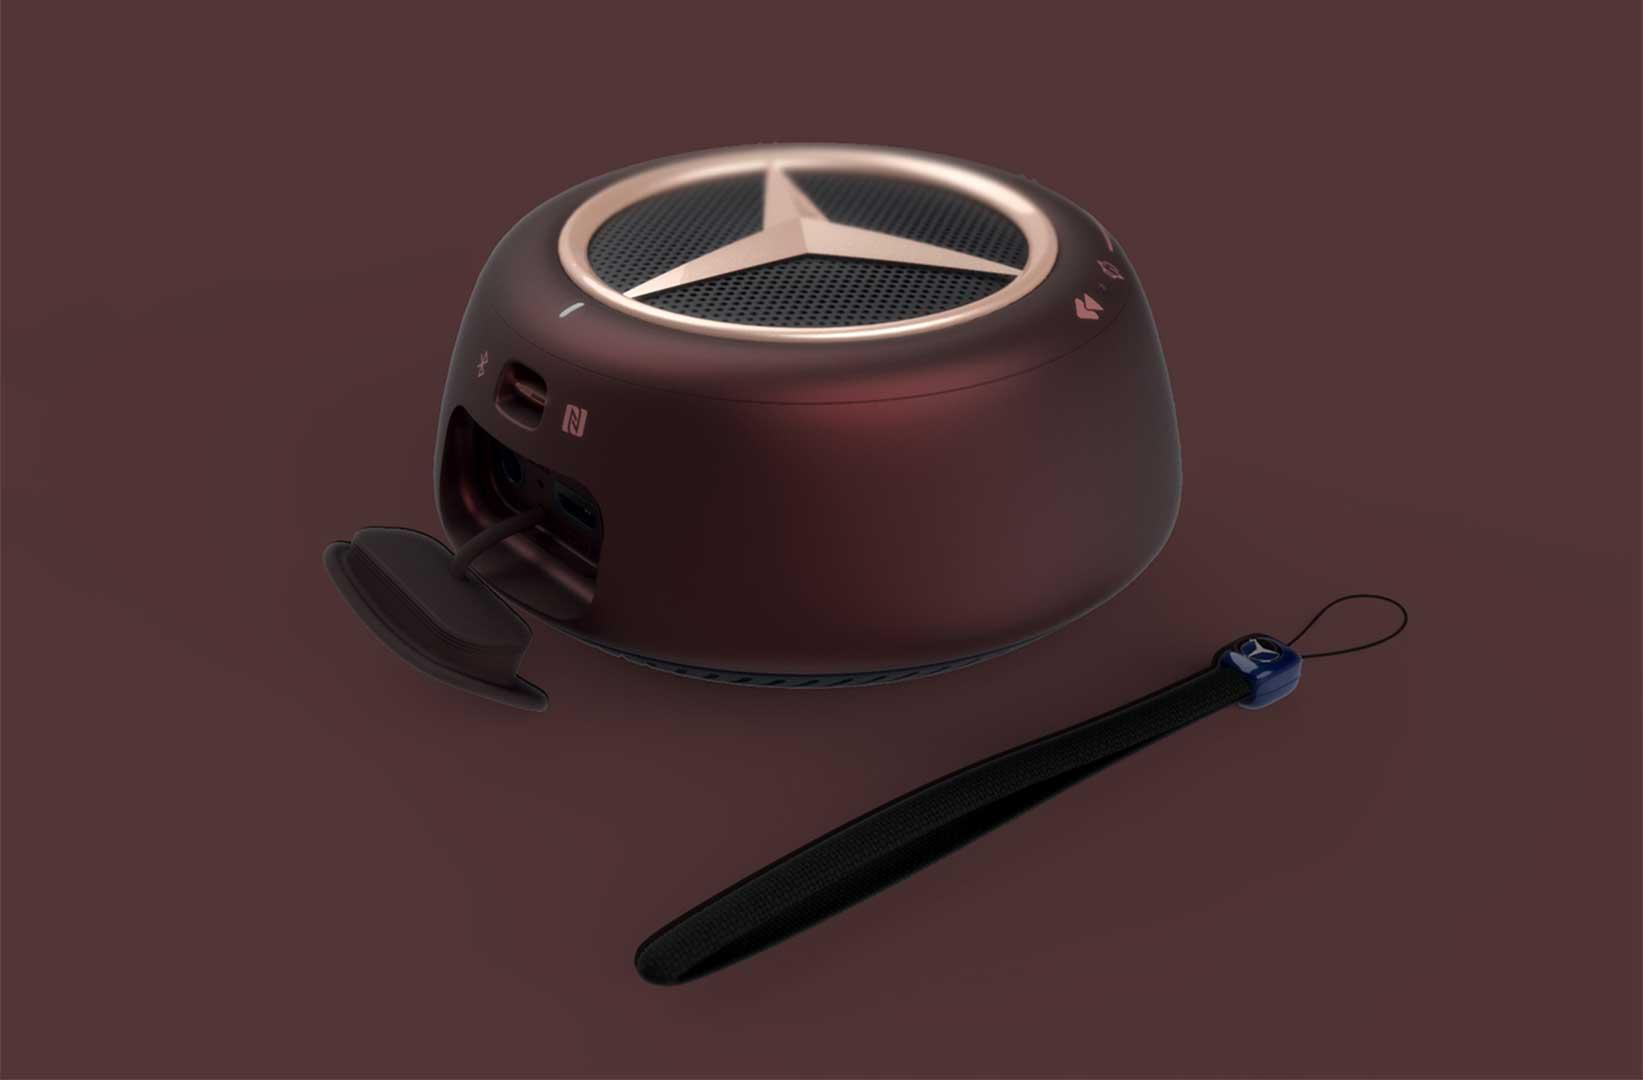 کمپانی مرسدس بنز -بلندکو خودرو